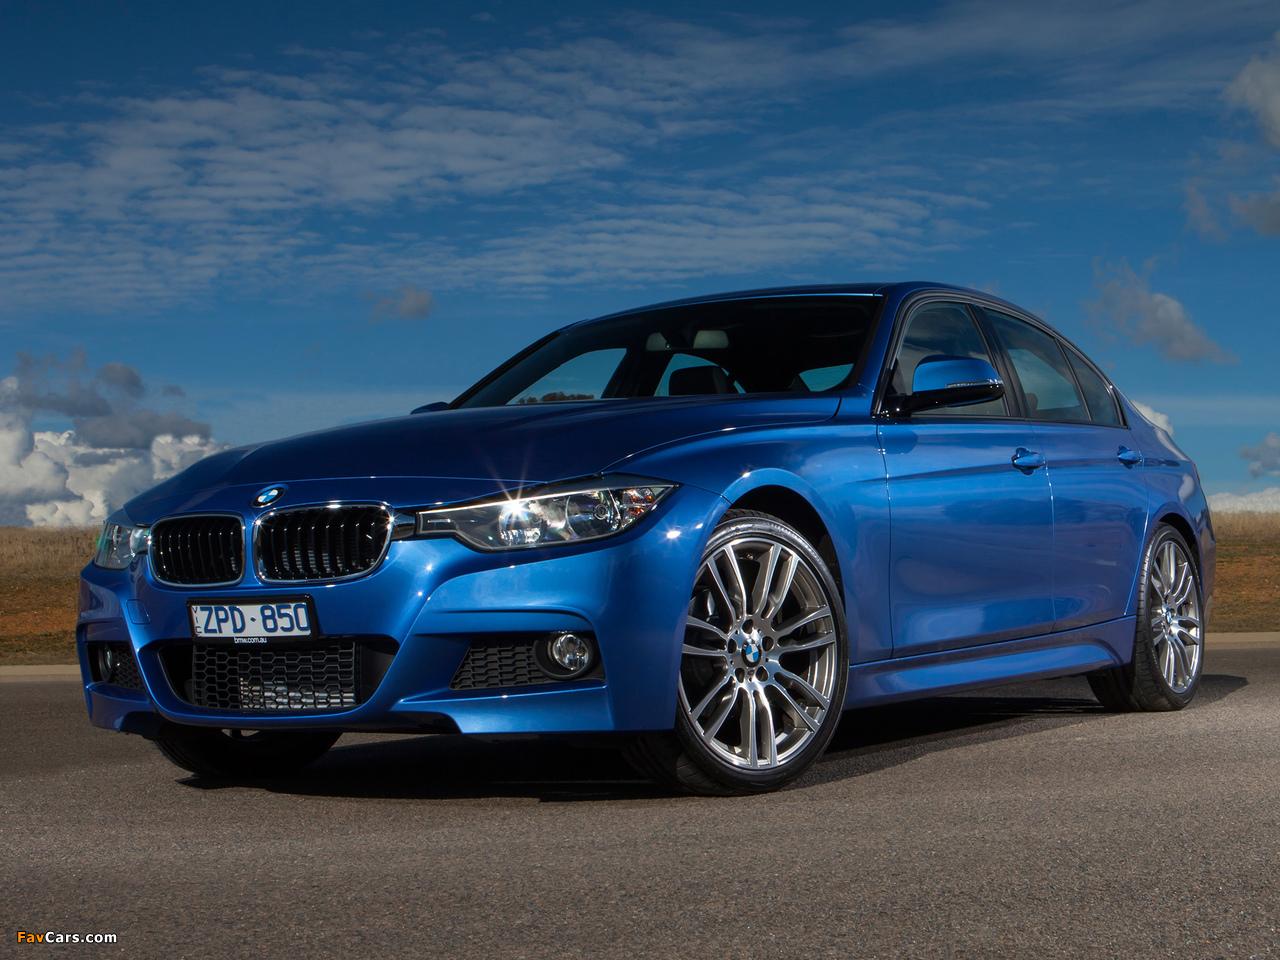 Bmw I Series >> BMW 316i Sedan M Sport Package AU-spec (F30) 2013 wallpapers (1280x960)